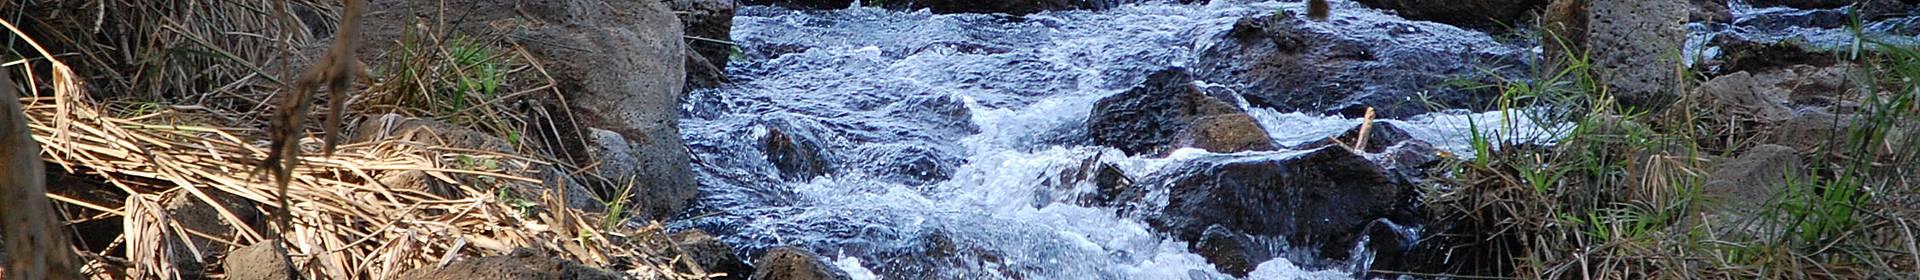 Rivière Tsavo